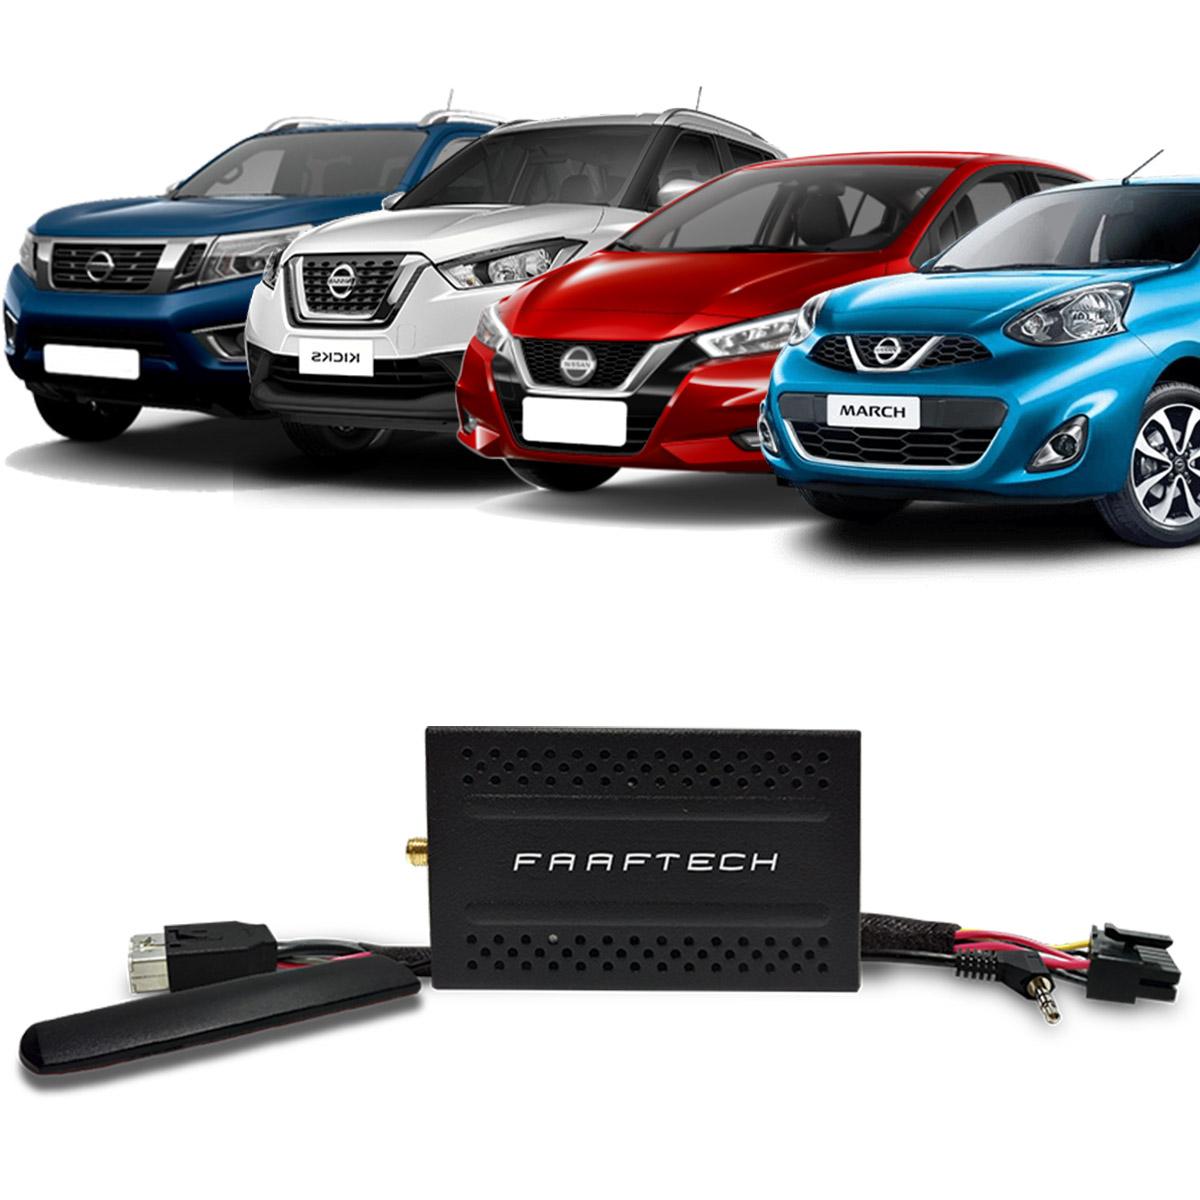 Desbloqueio De Multimidia com TV Digital 1SEG Faaftech Nissan FT-VF-NS3-1SEG